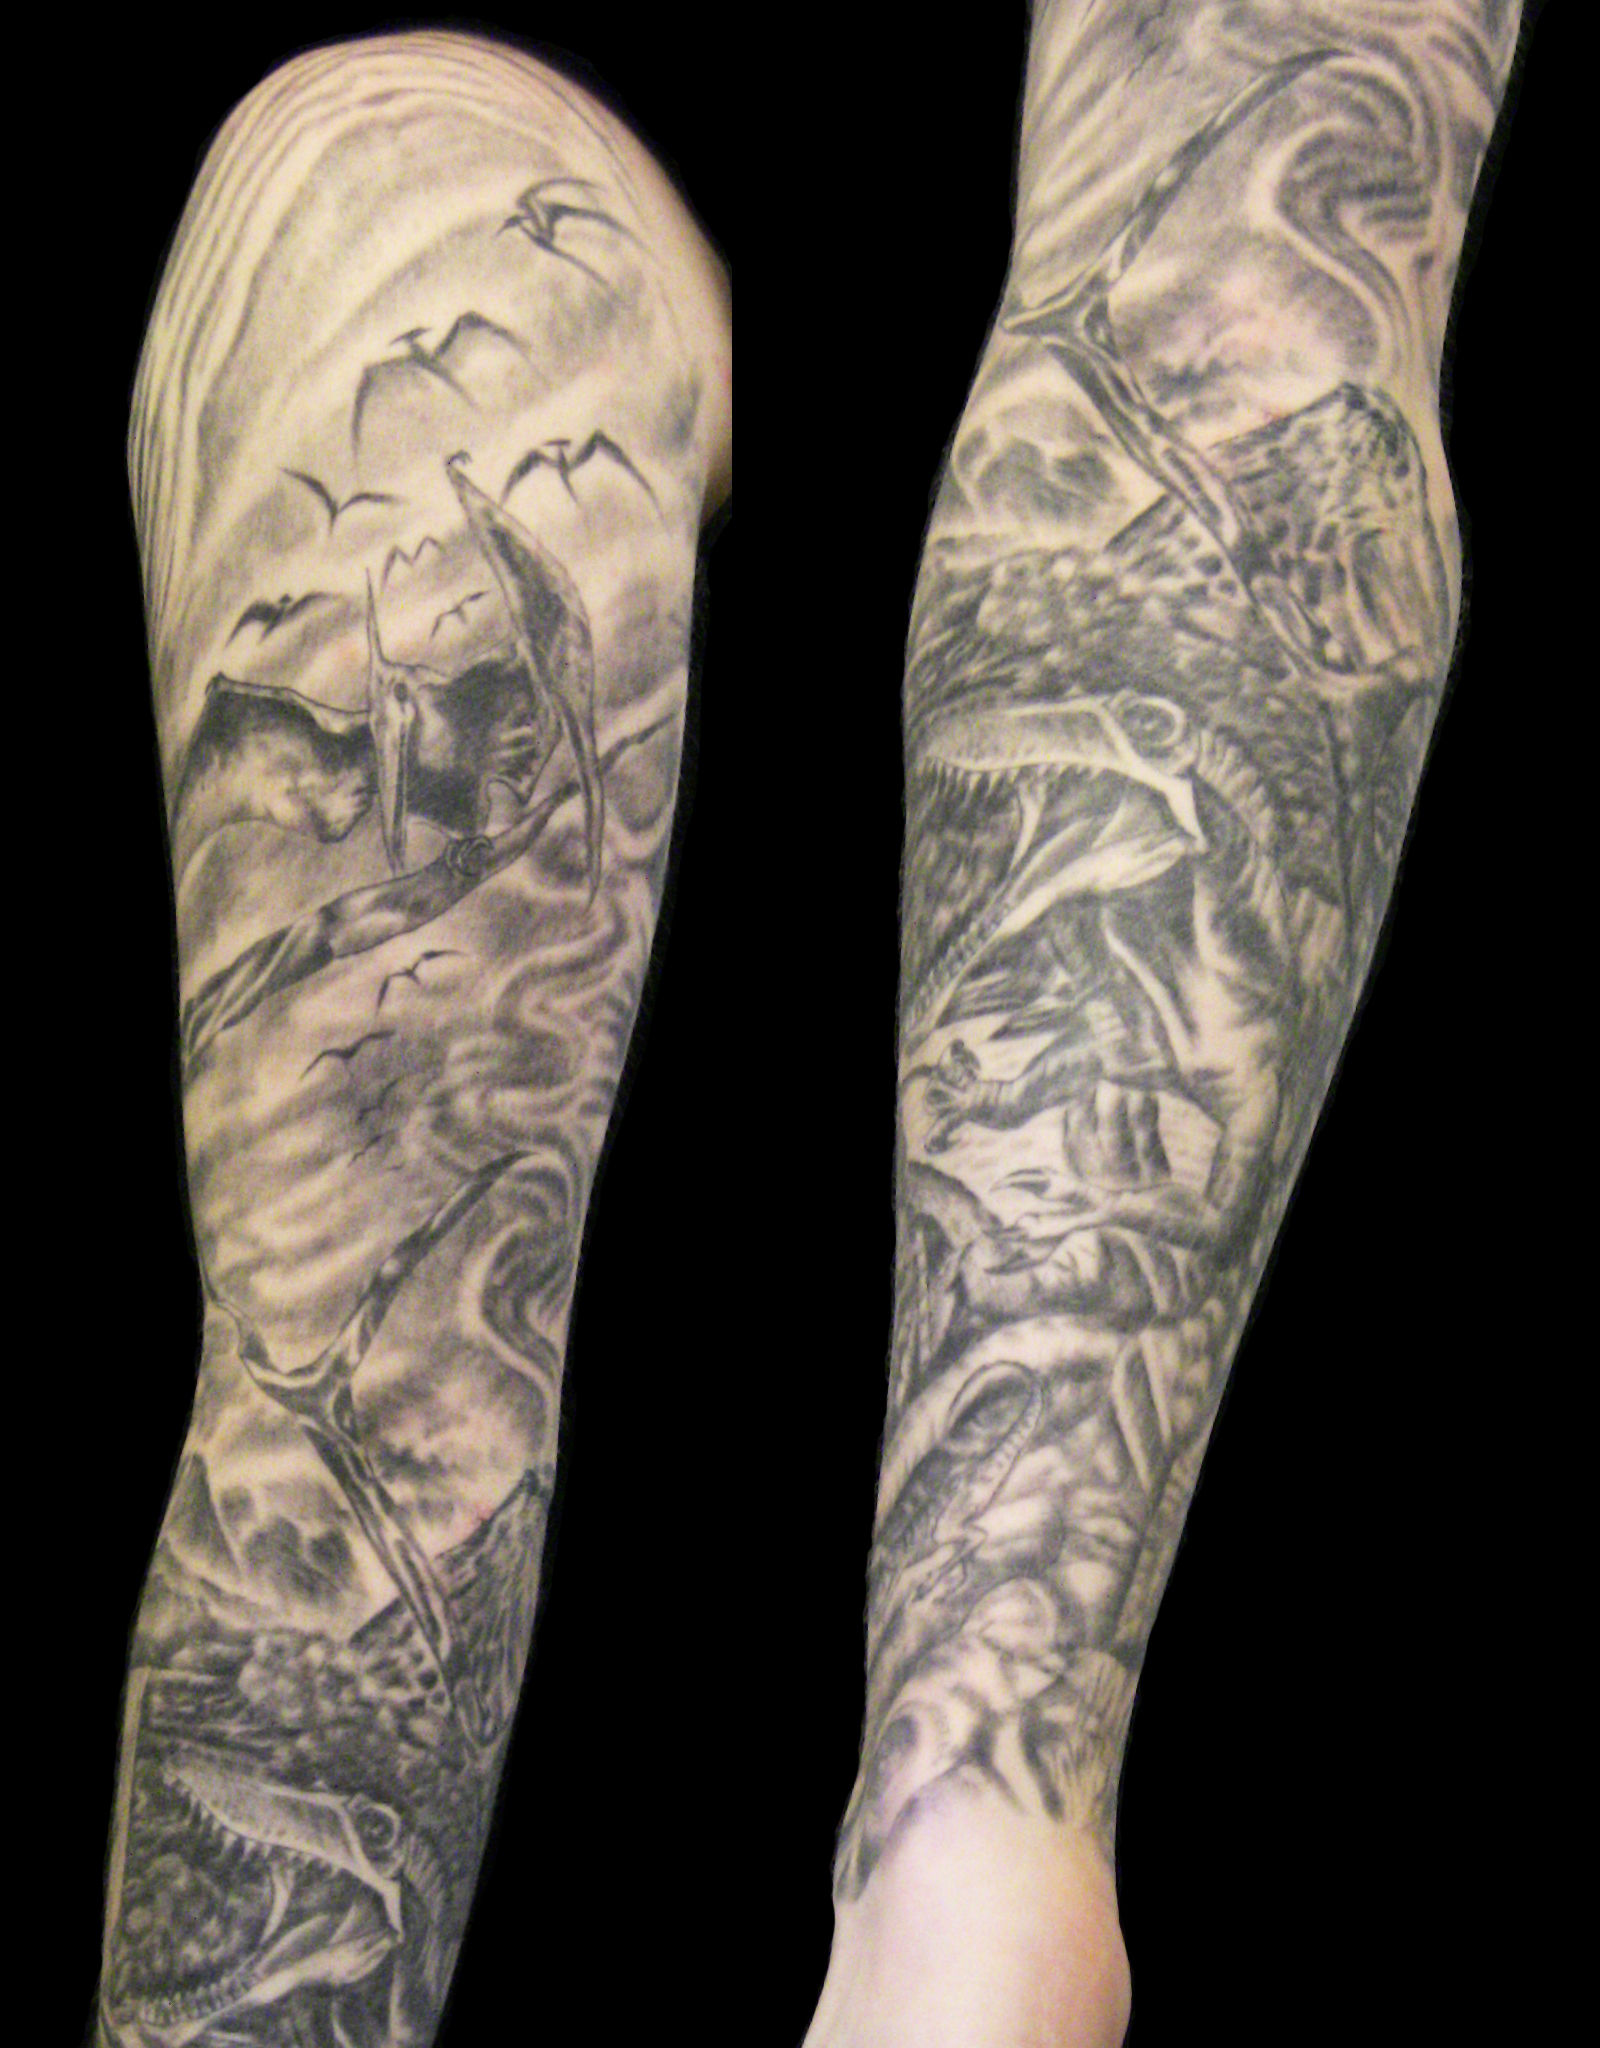 Sick Tattoo Sleeves Dinosaur Sleeve Part By Jesse Flip Degf